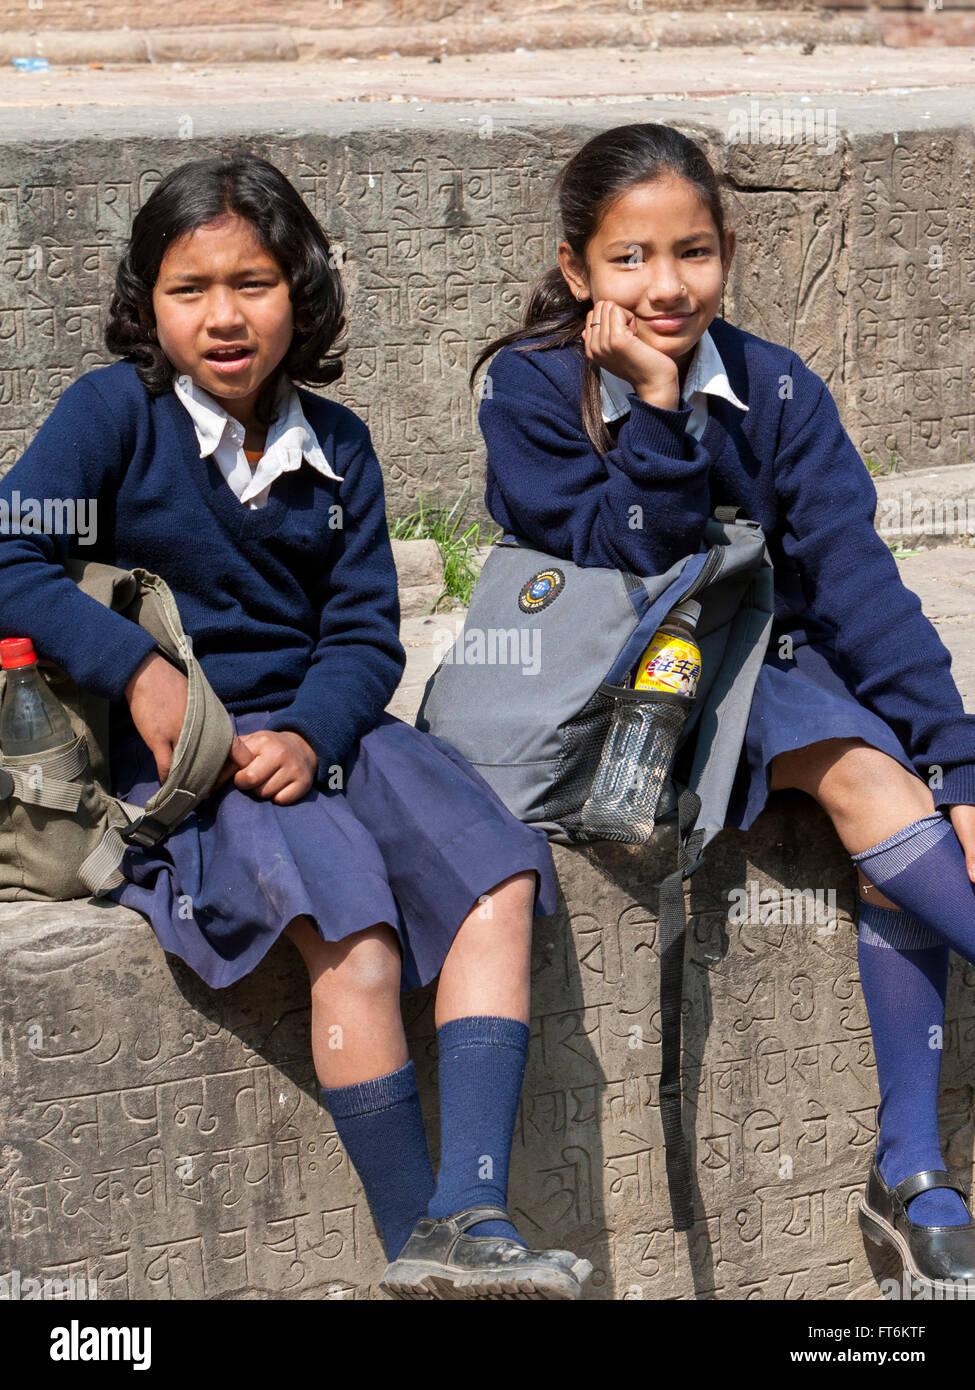 0fa0d719dcc Nepalese Uniform Stock Photos & Nepalese Uniform Stock Images - Alamy